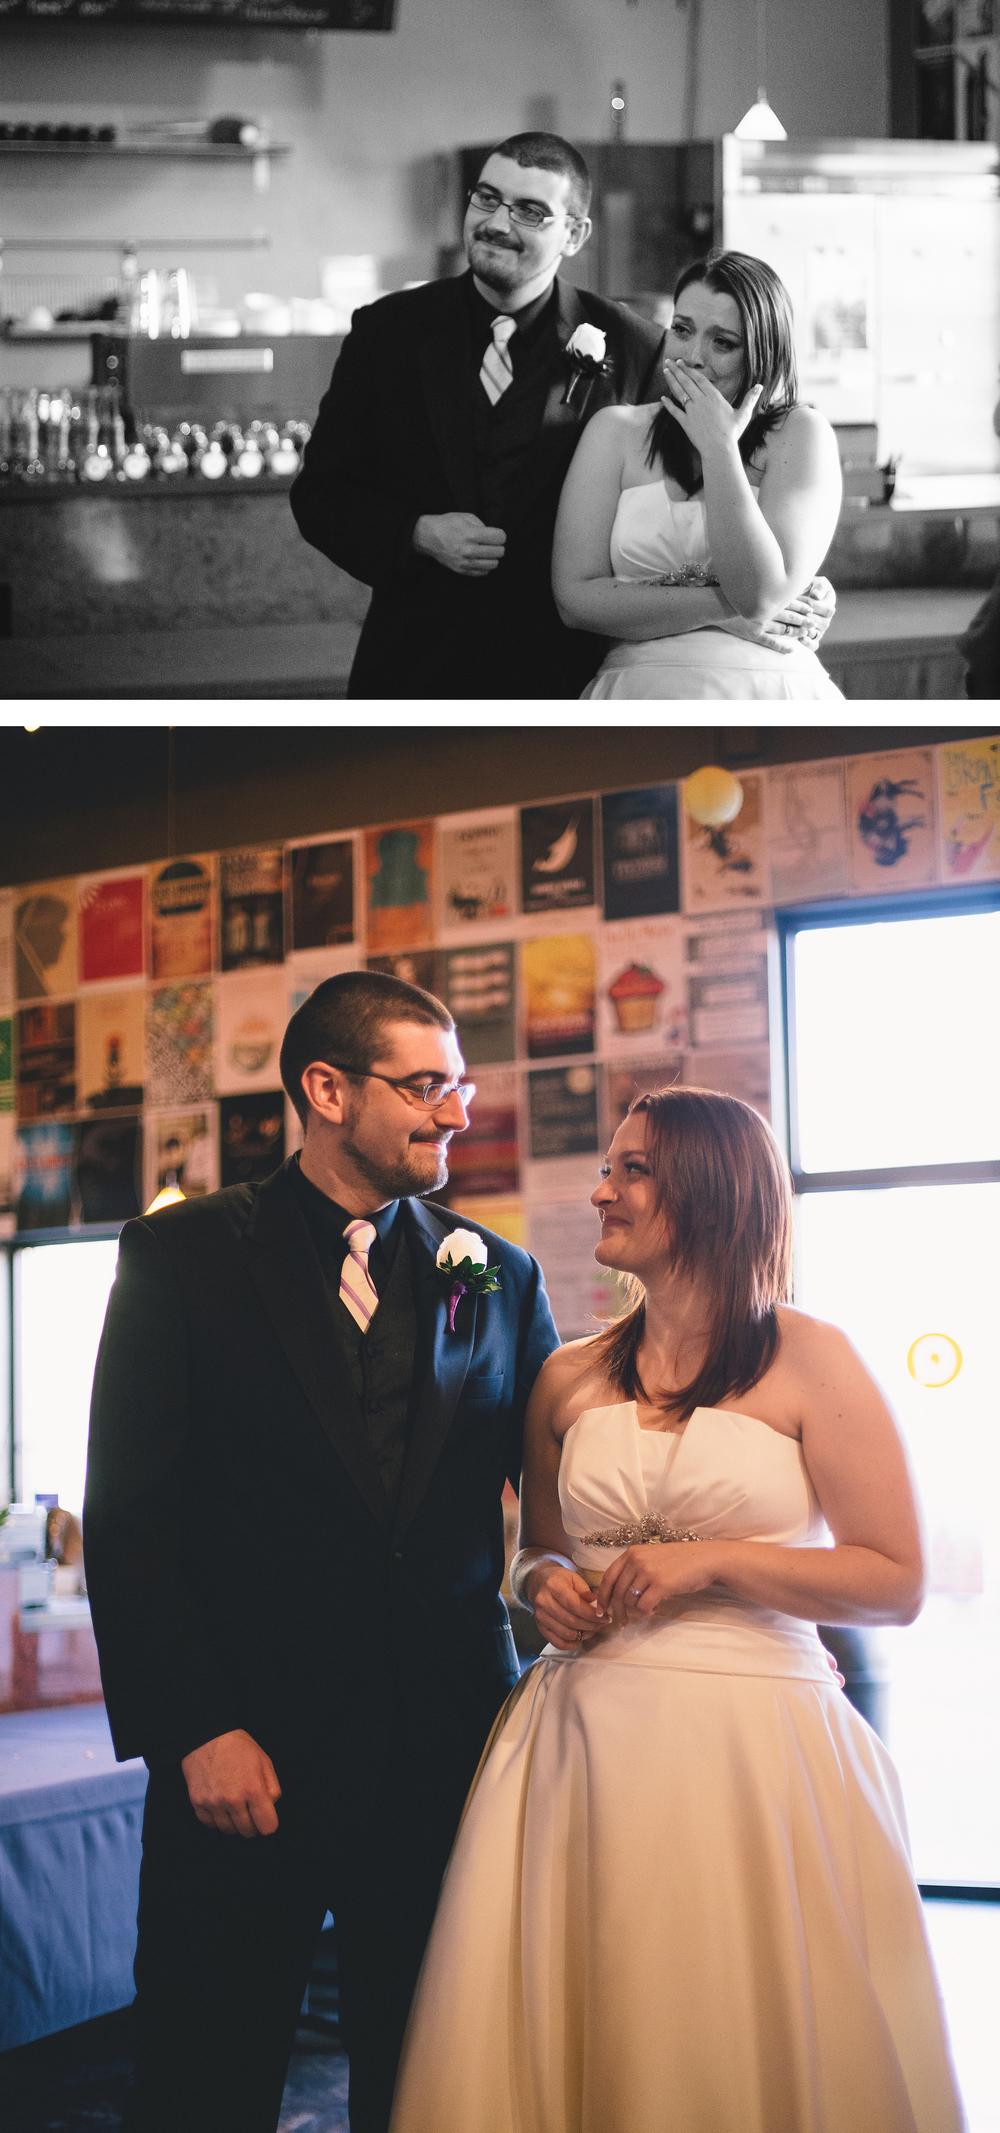 Eklund-Wedding-Q-Cafe-Reception-6.jpg